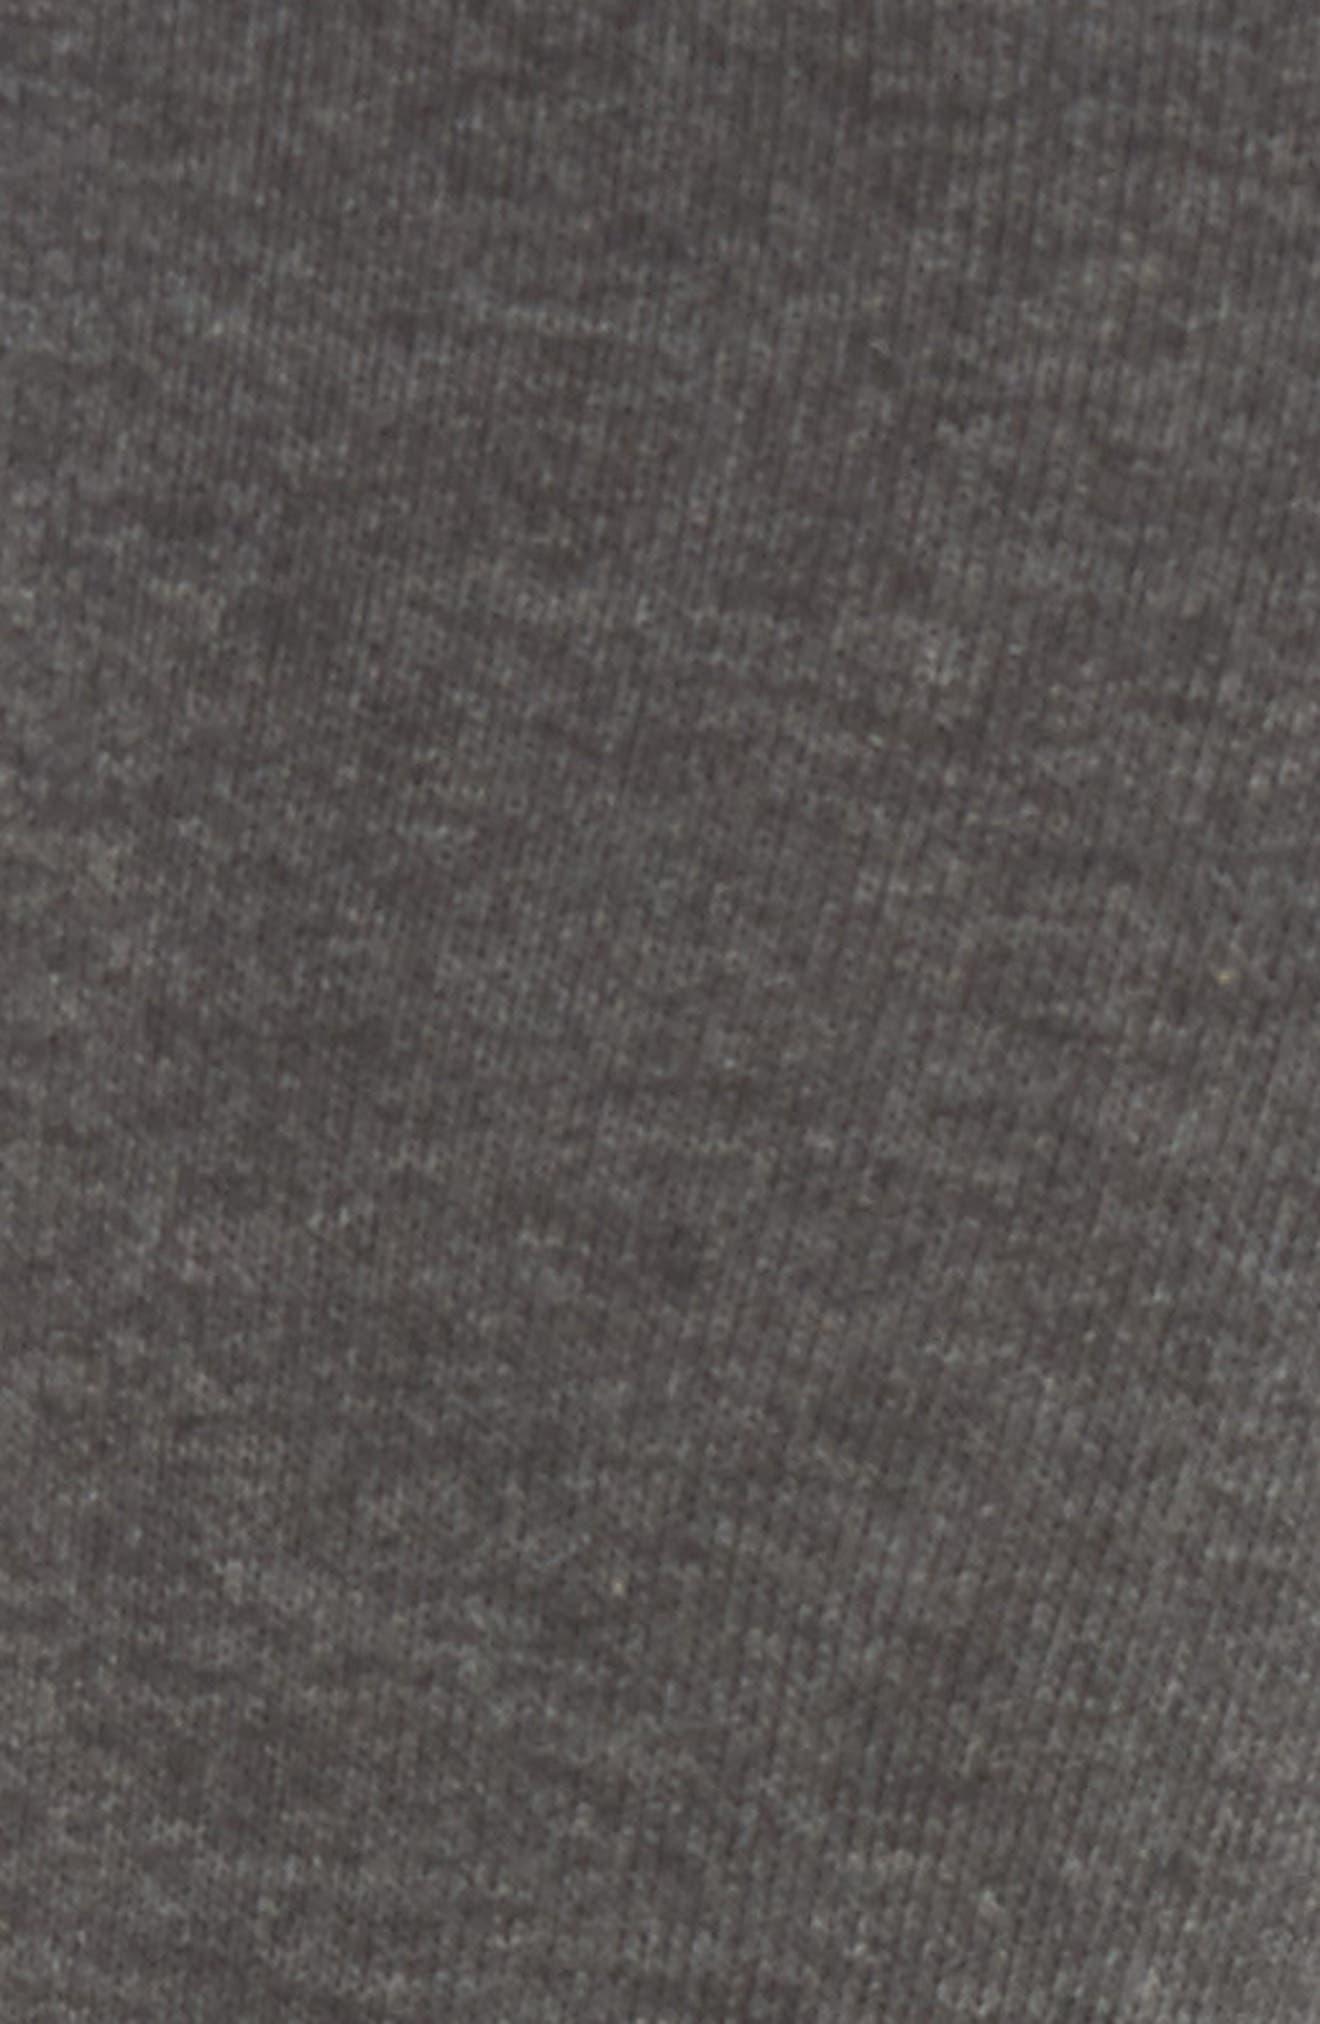 Keep Vibing Crew Socks,                             Alternate thumbnail 3, color,                             Charcoal Heather